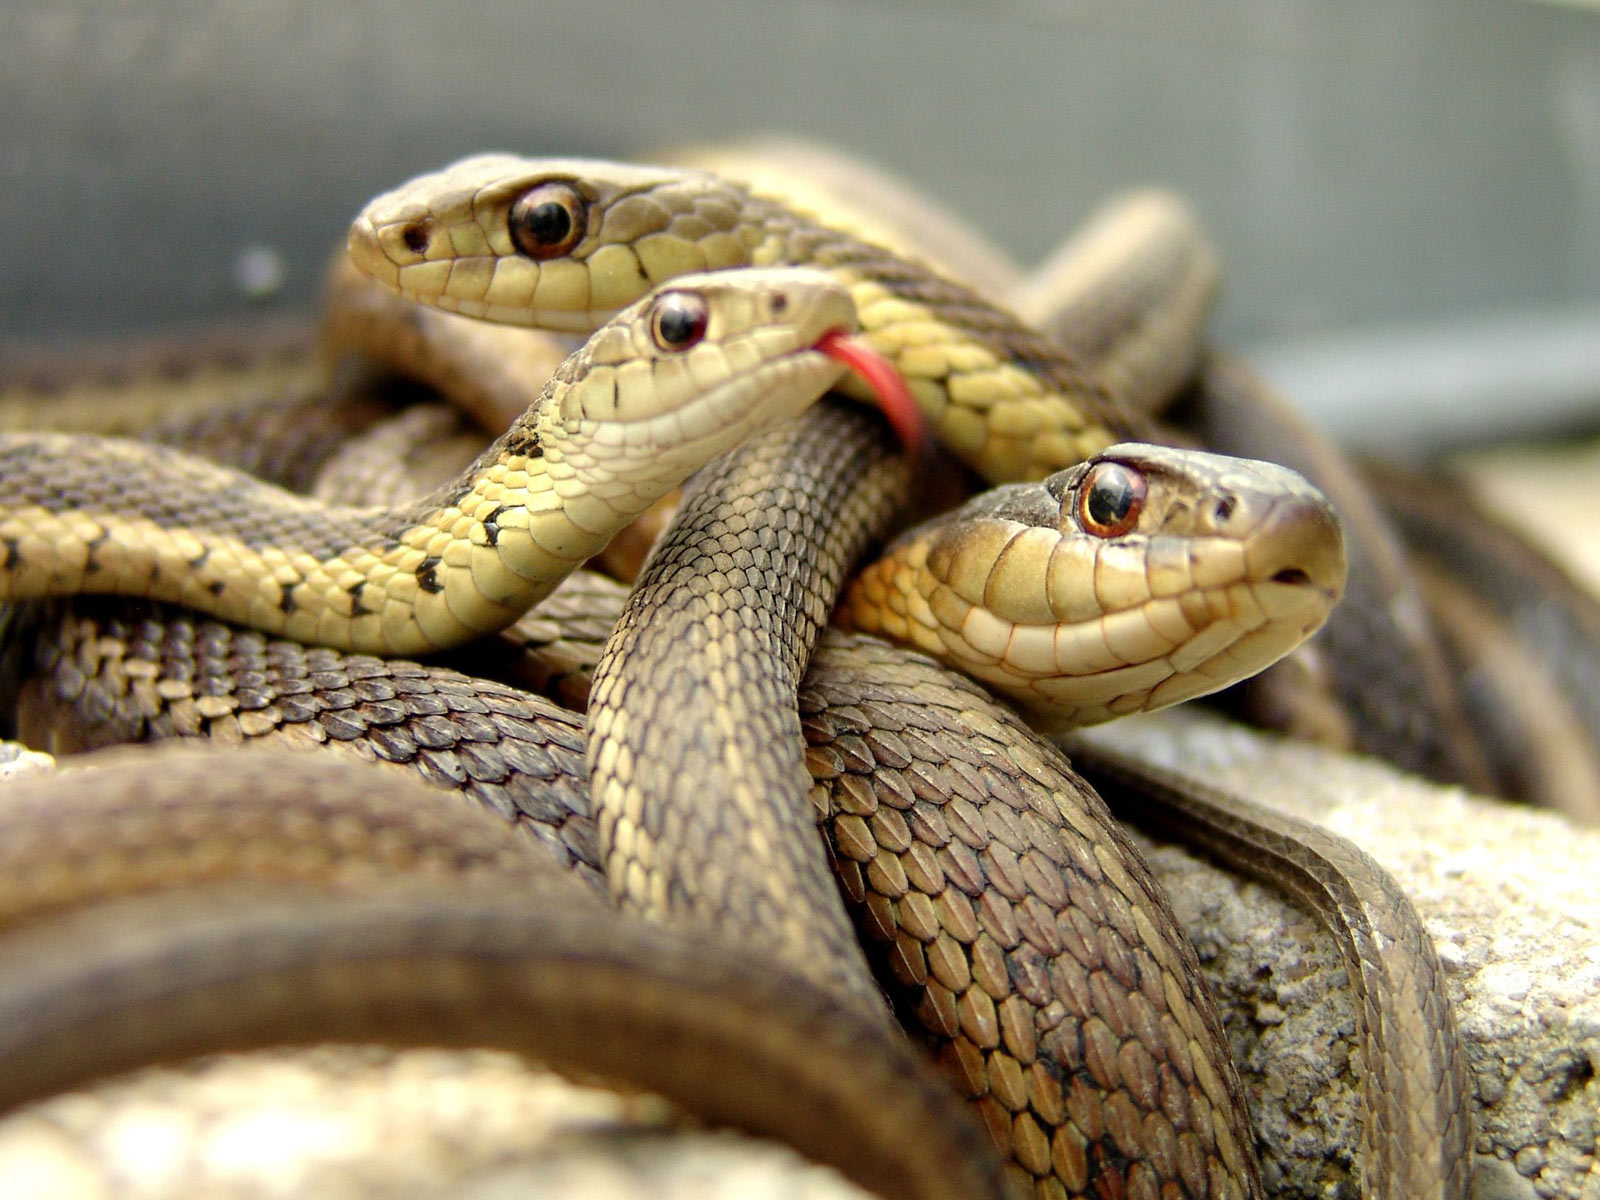 http://1.bp.blogspot.com/-OcmjznkKHbk/UEX6WLyZT1I/AAAAAAAABUc/dO-yTQmbWug/s1600/snake%2Bwallpapers%2Bhd%2B4.jpg